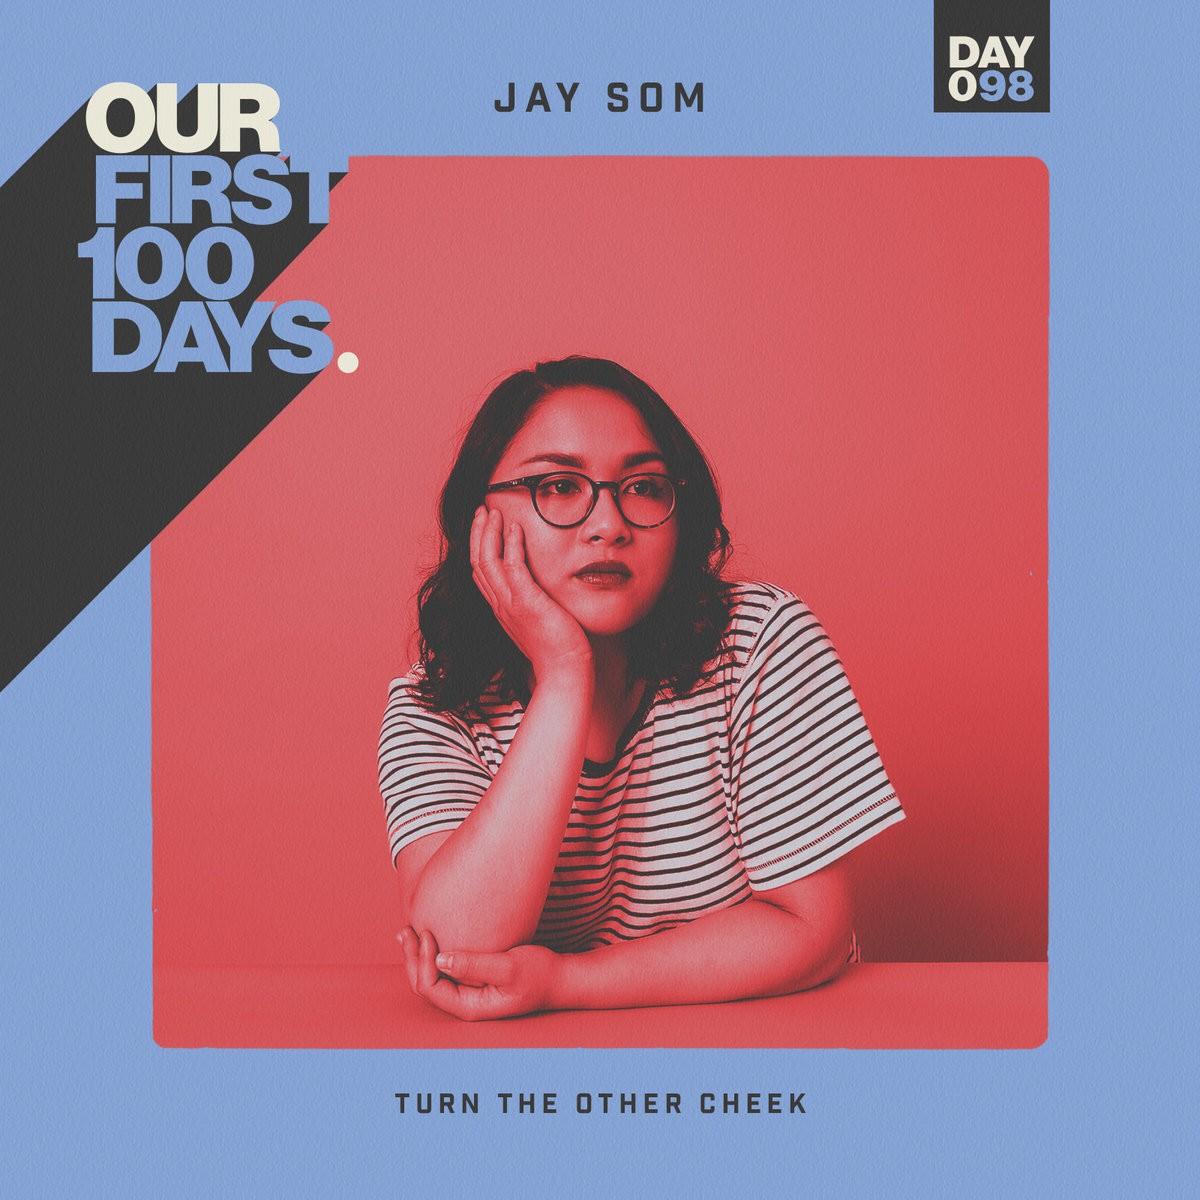 jay-som-turn-the-other-cheek-stream-1493311504